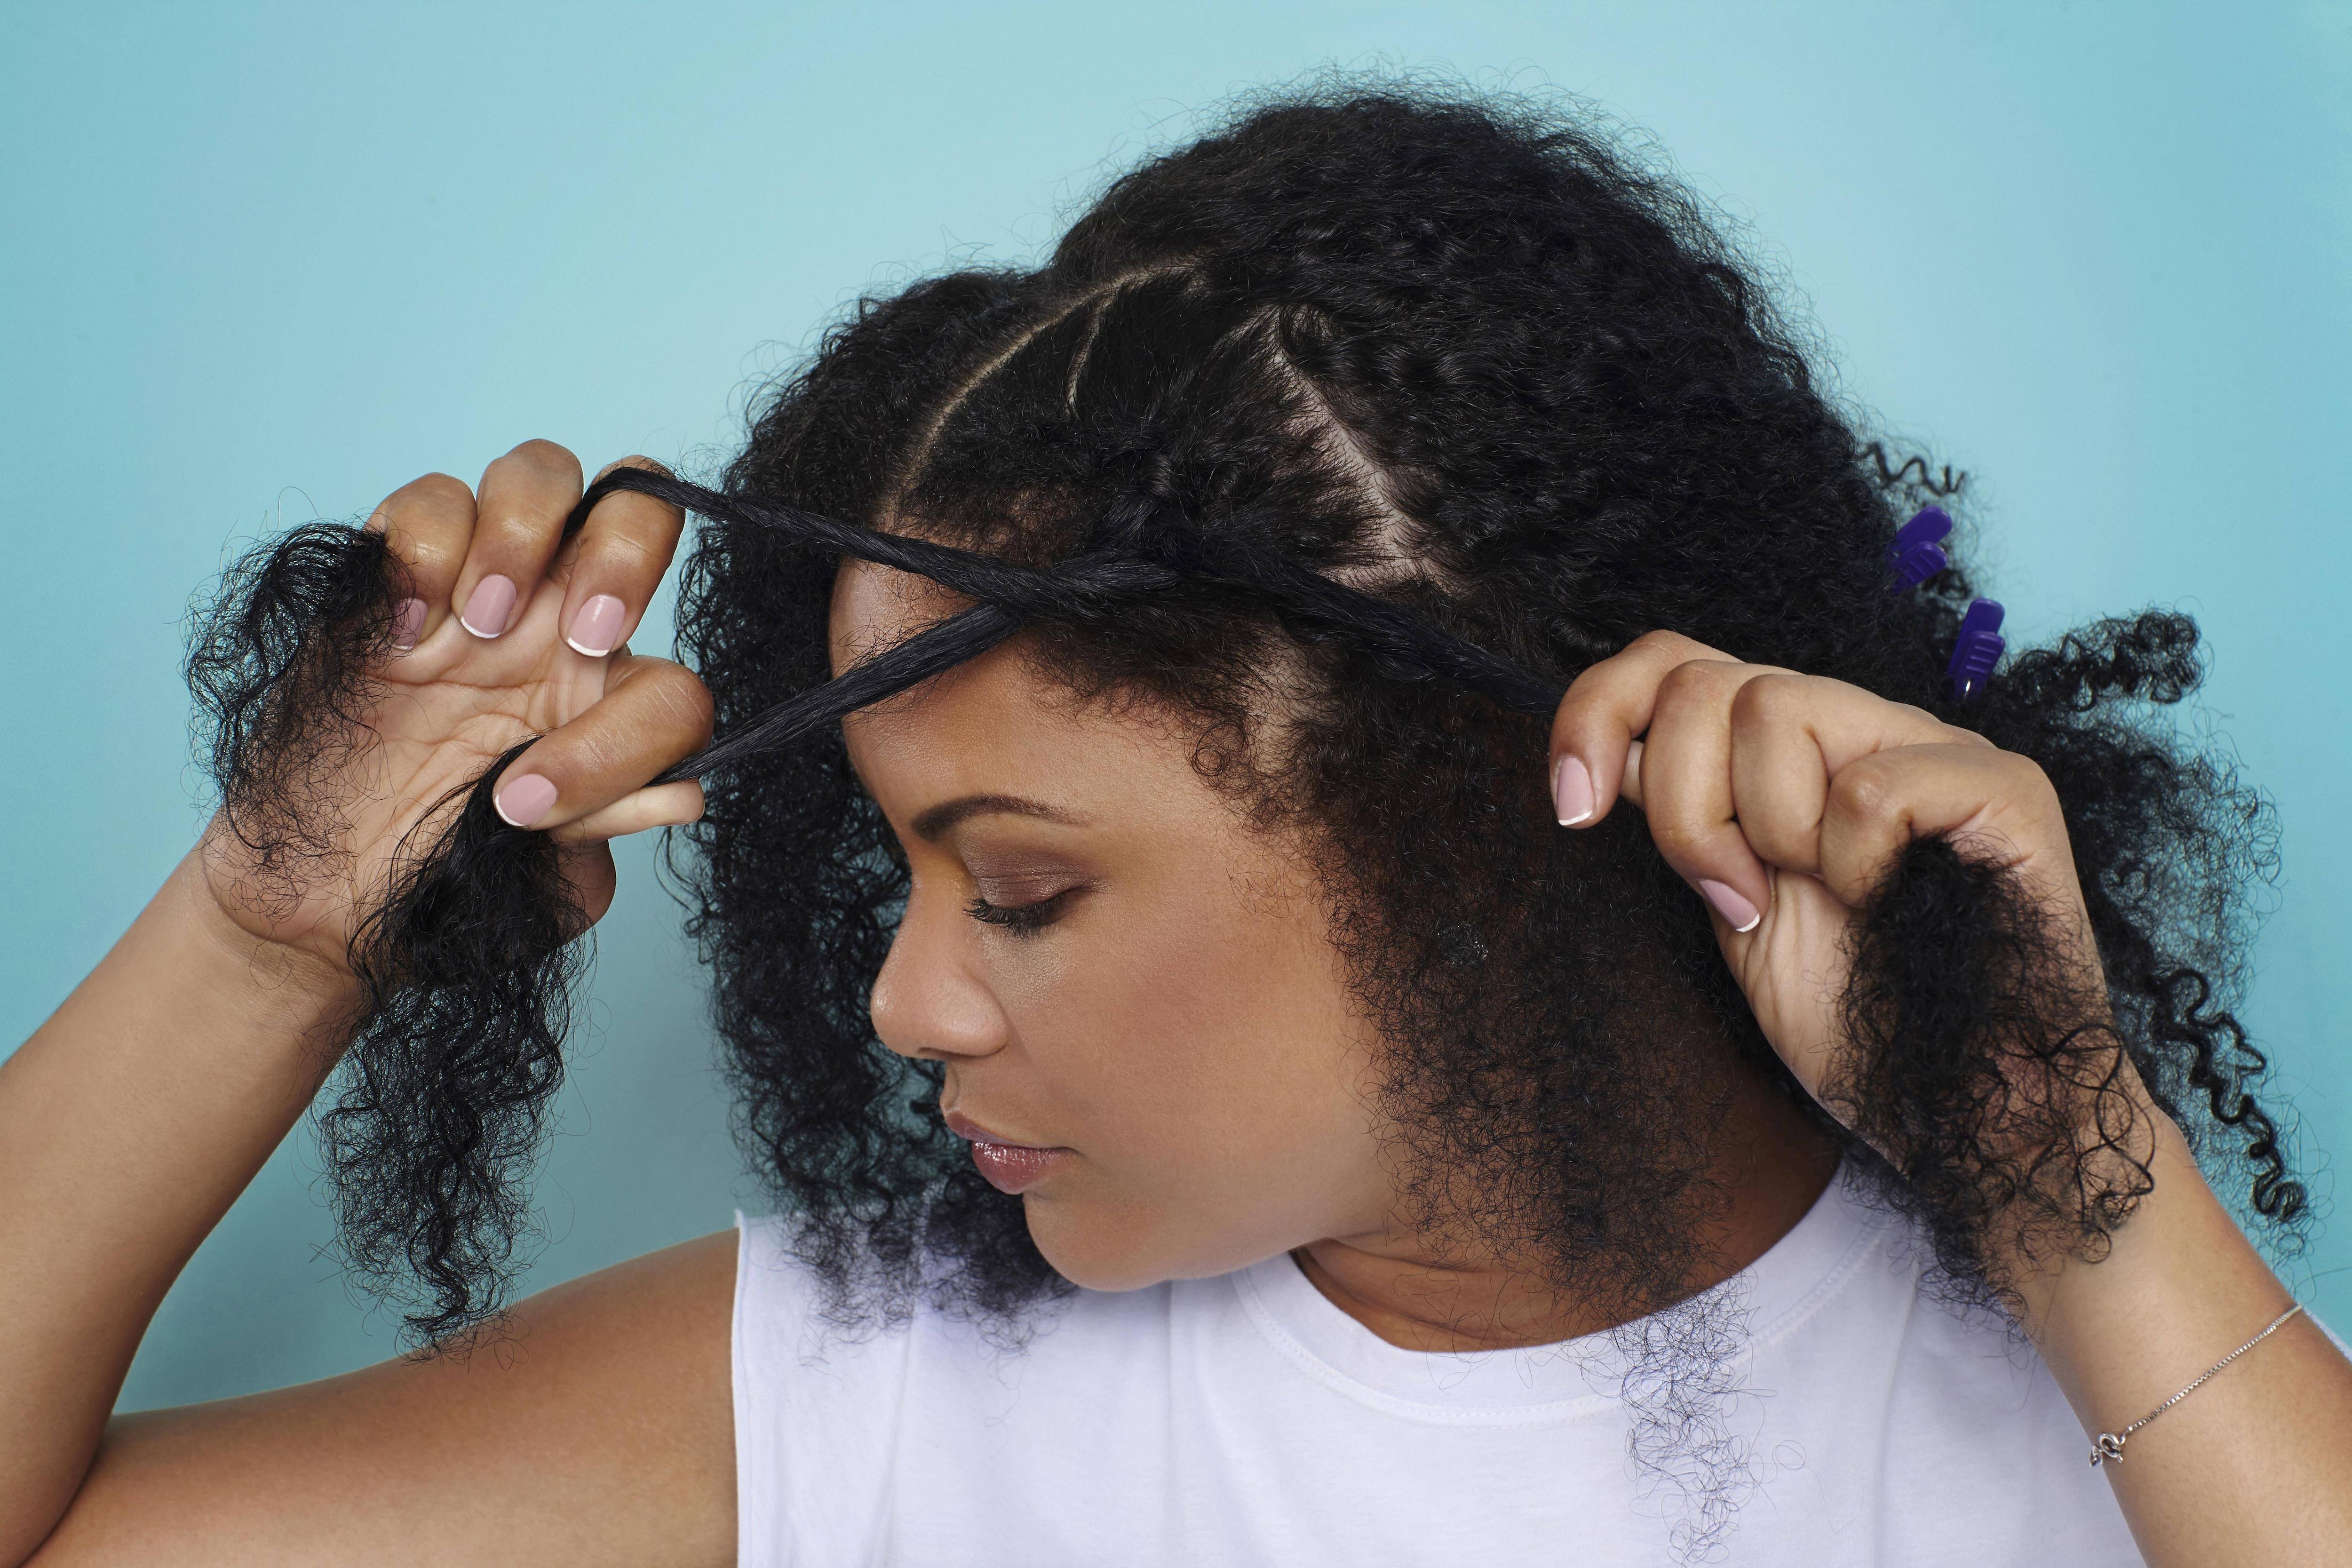 Braid Styles With Natural Hair: Natural Hair Braids: An Easy Dutch Braid/Pony Combo For